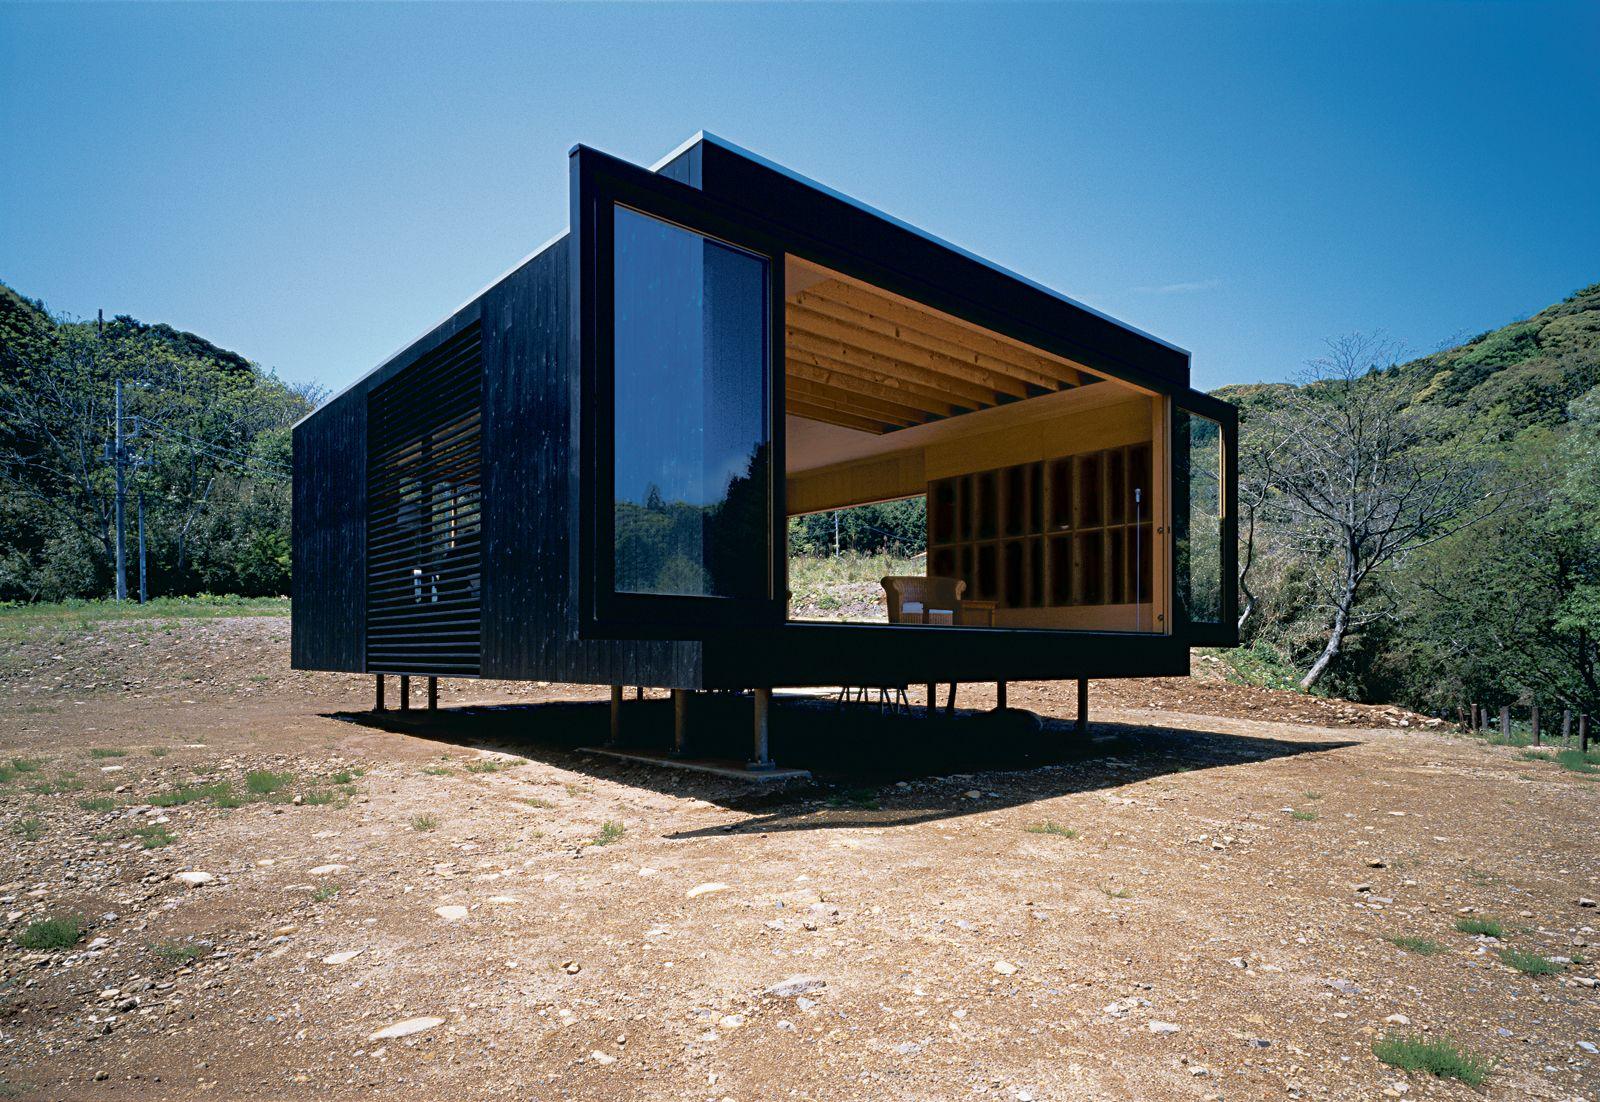 Prefab homes set on stilts dwell a version of - Casas de modulos ...